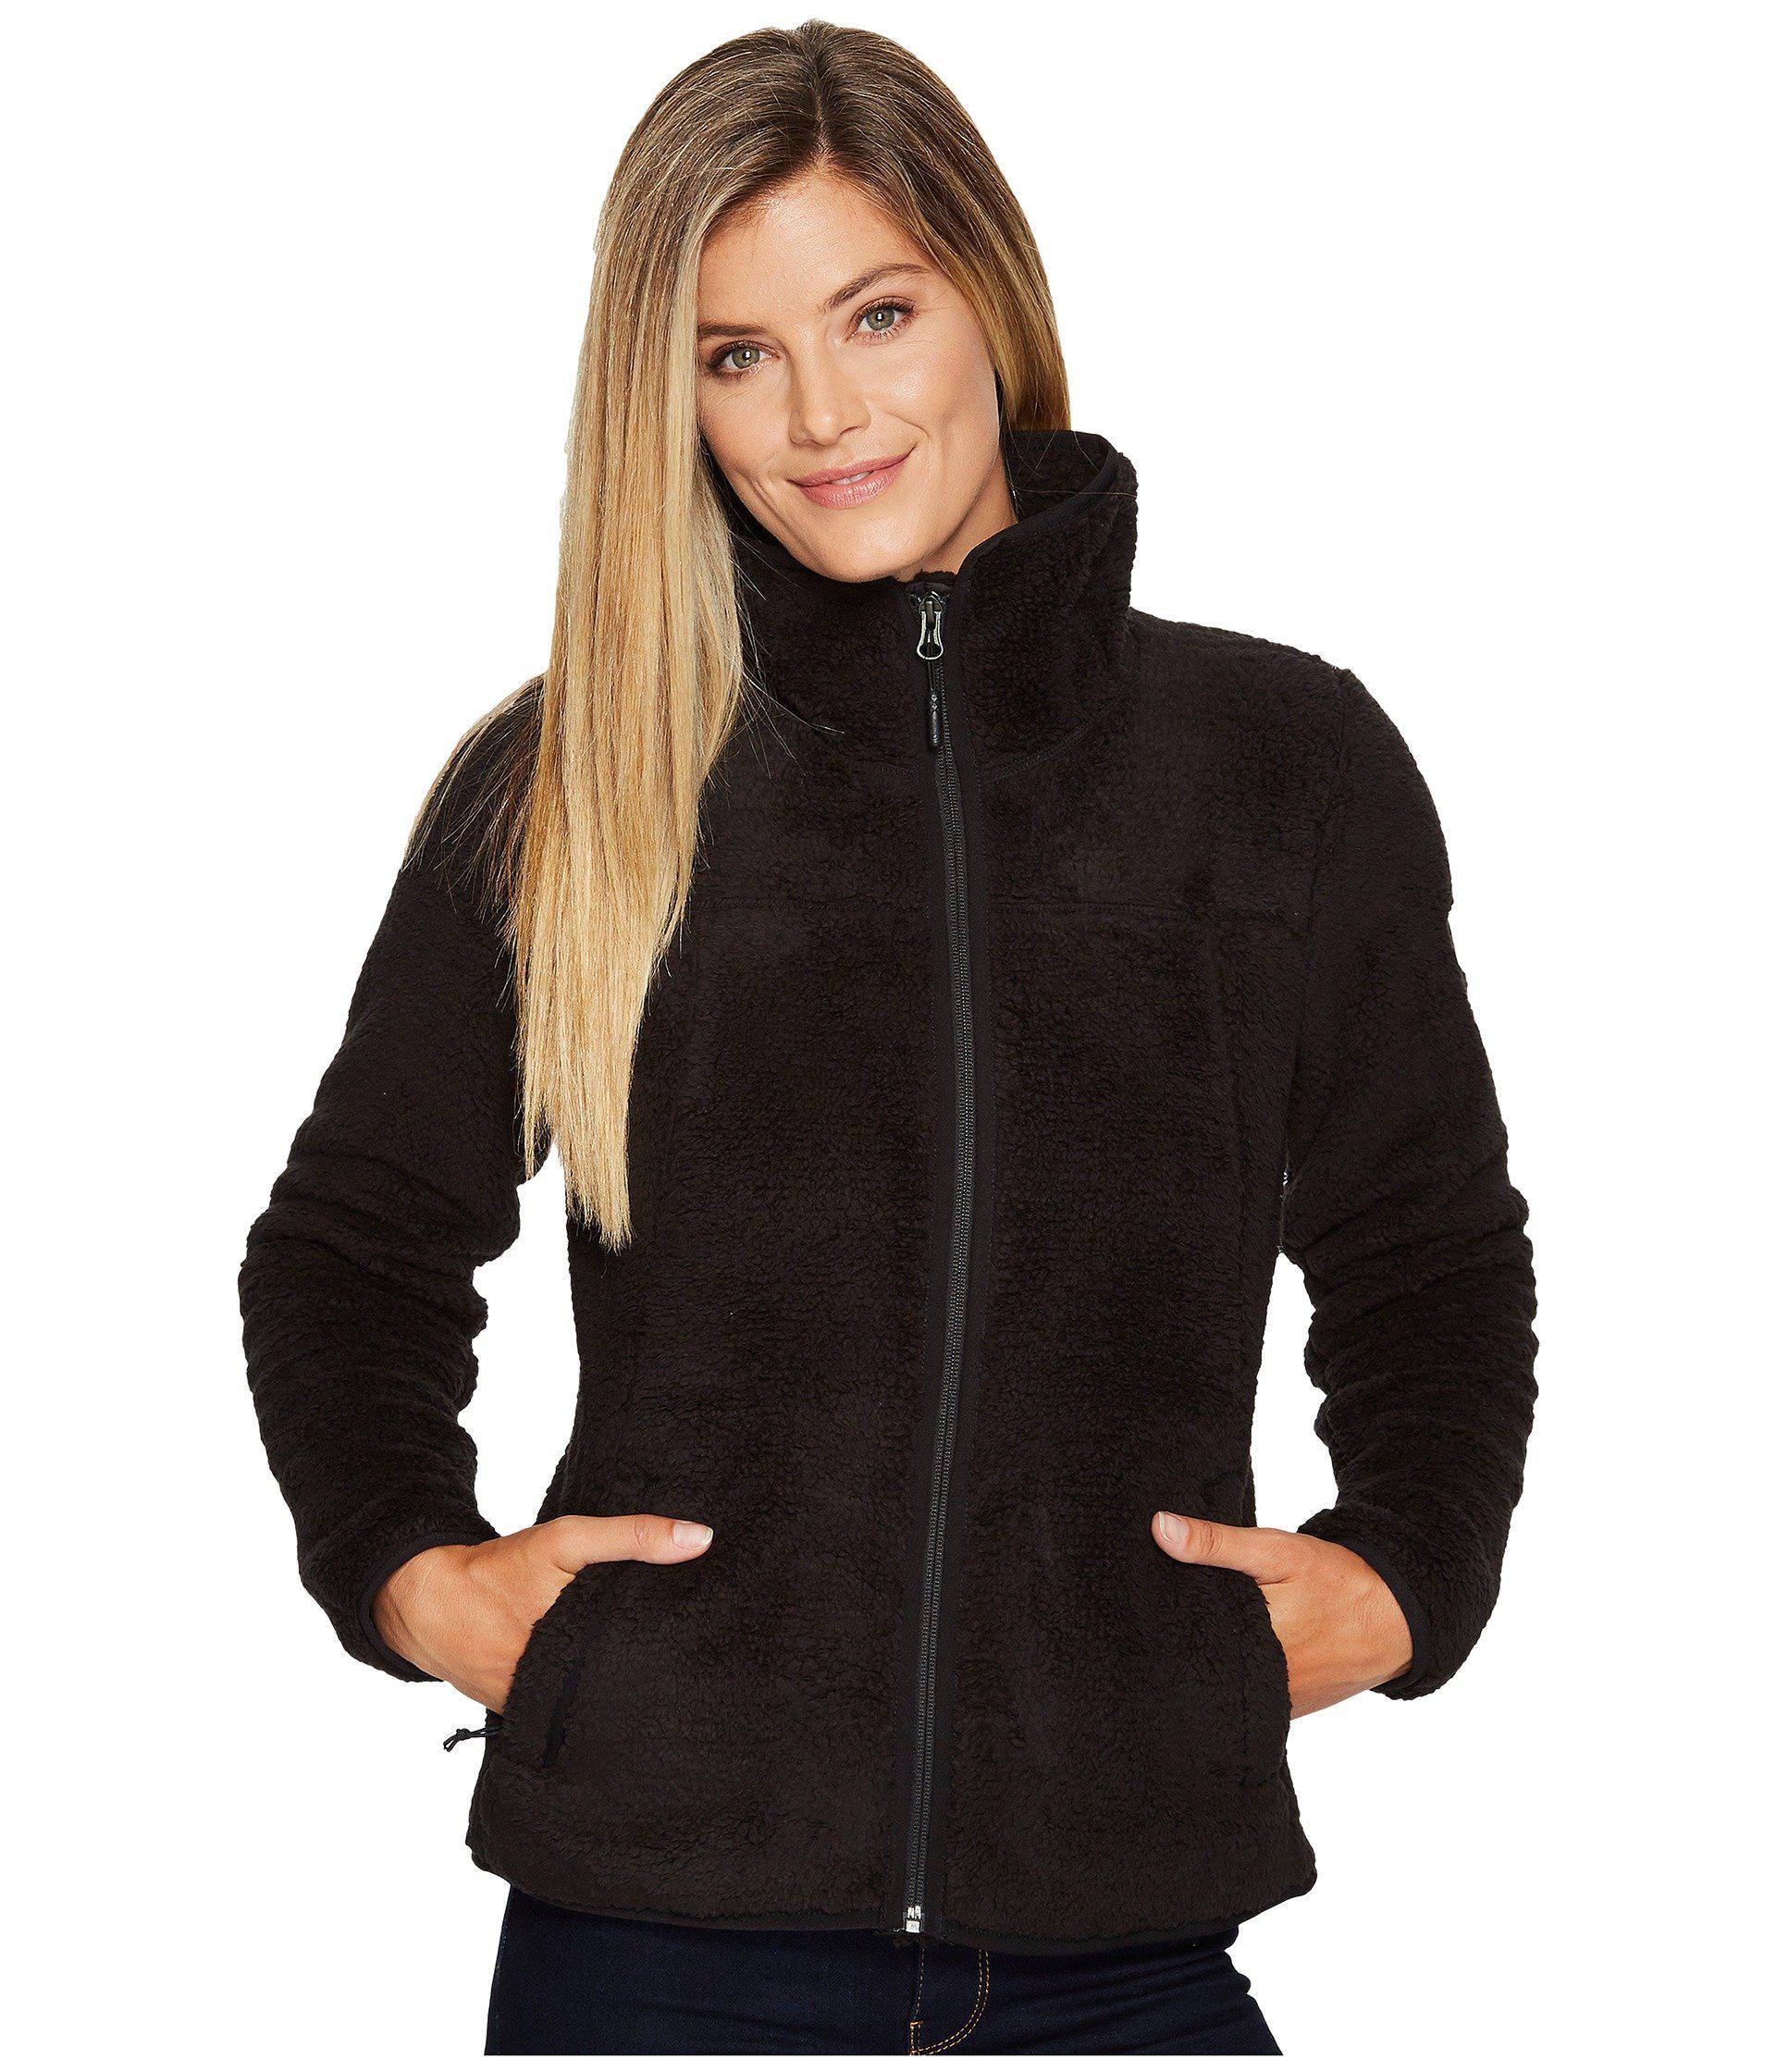 7a5cc906d8f The North Face. Campshire Full Zip (tnf Black) Women s Sweatshirt